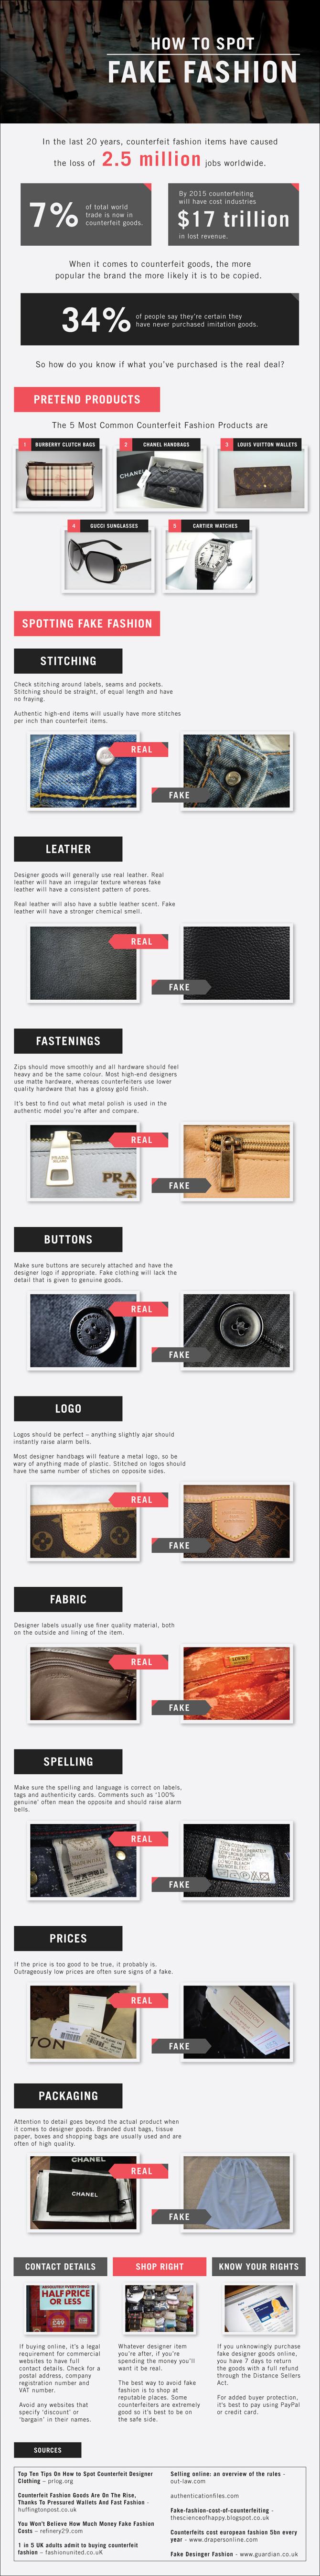 9. How to Spot Fake Fashion